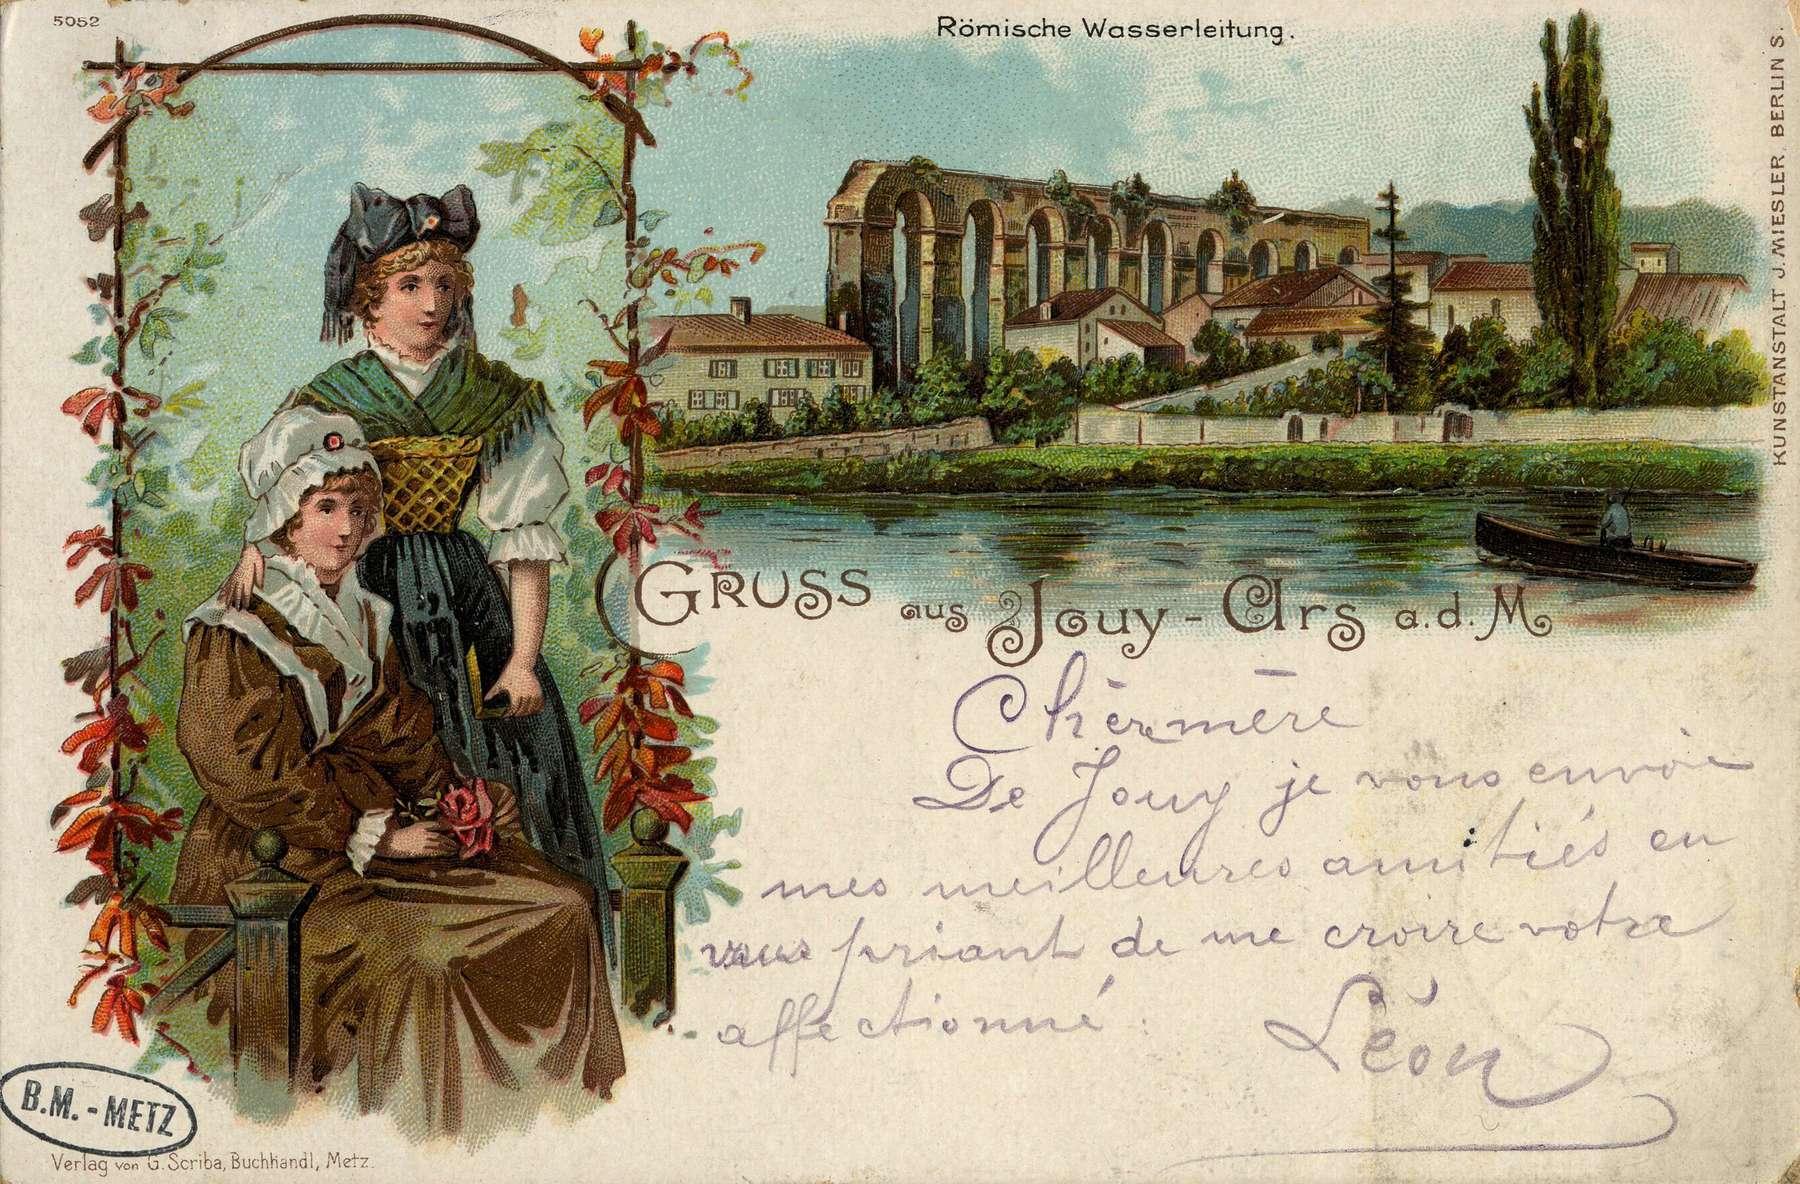 Contenu du Gruss aus Jouy-Ars a.d. M. Römische Wasserleitung